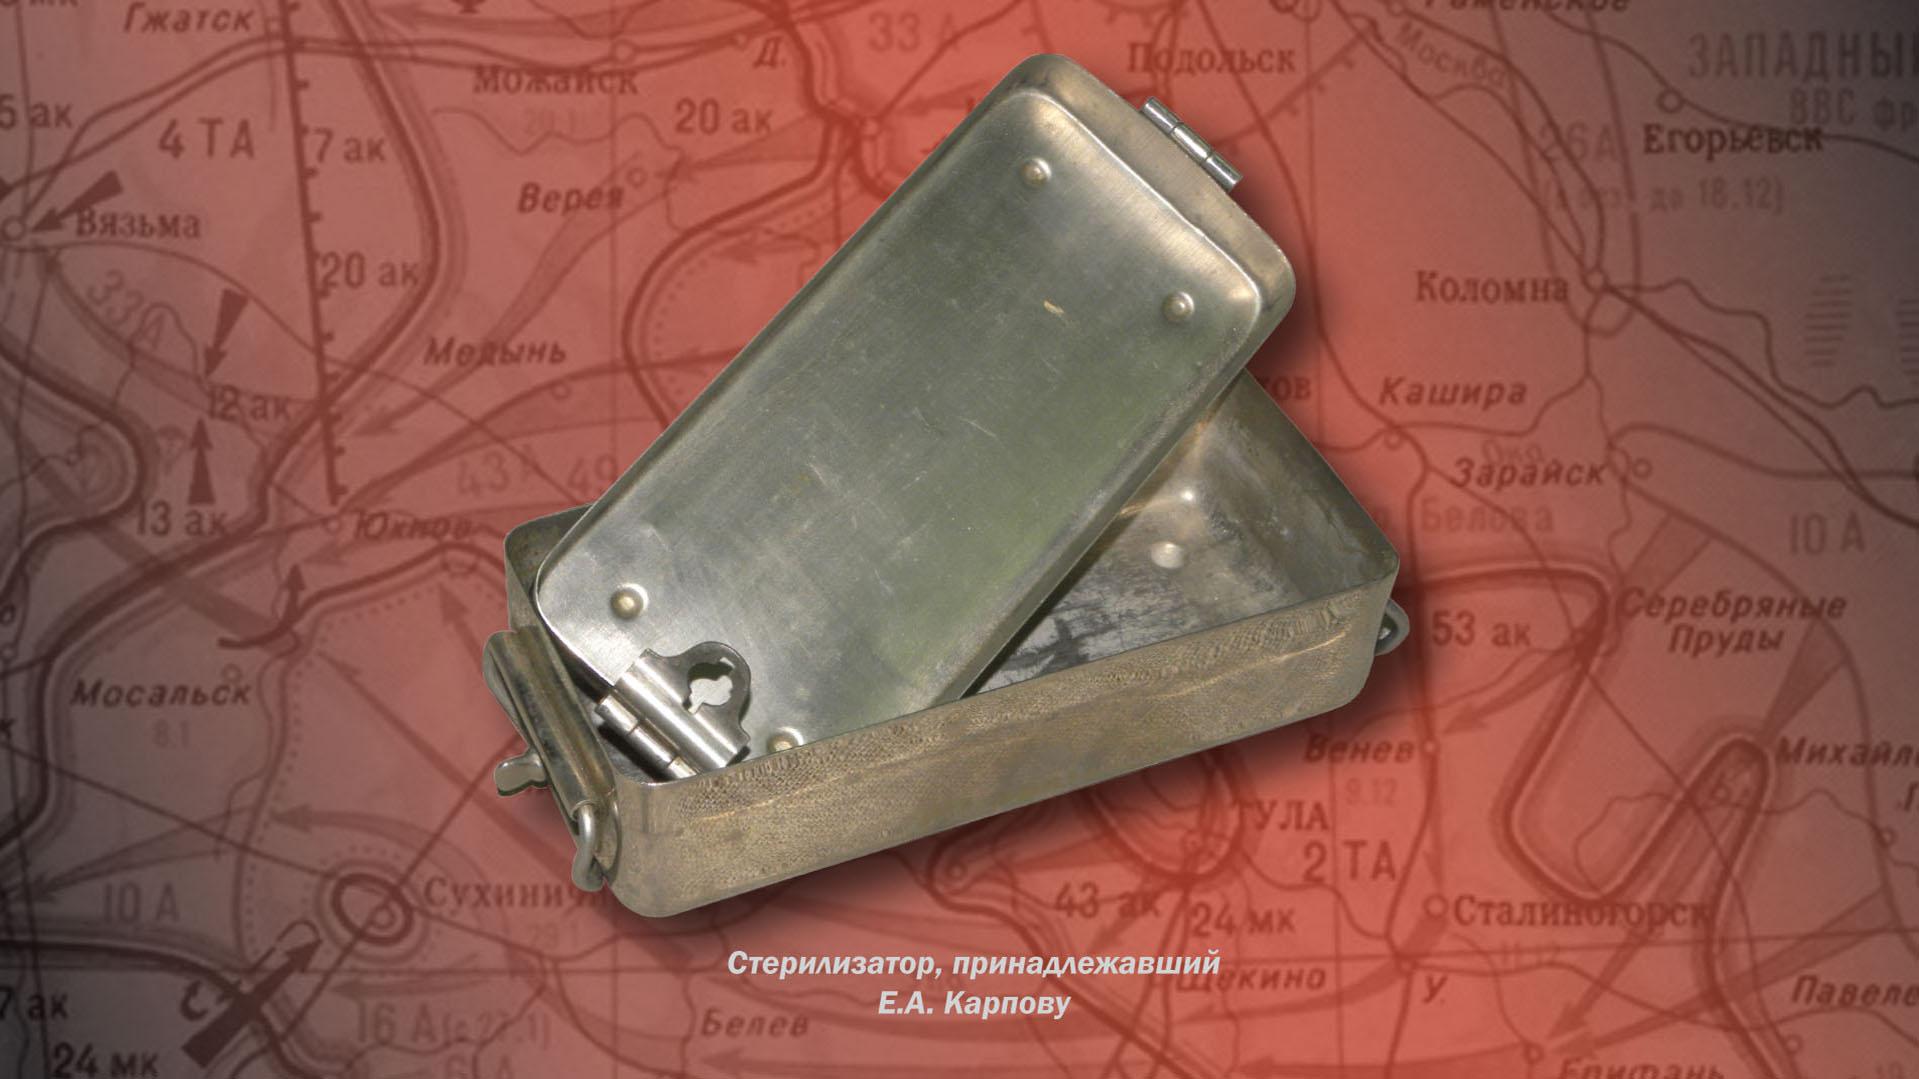 Стерилизатор, принадлежащий Е.А. Карпову